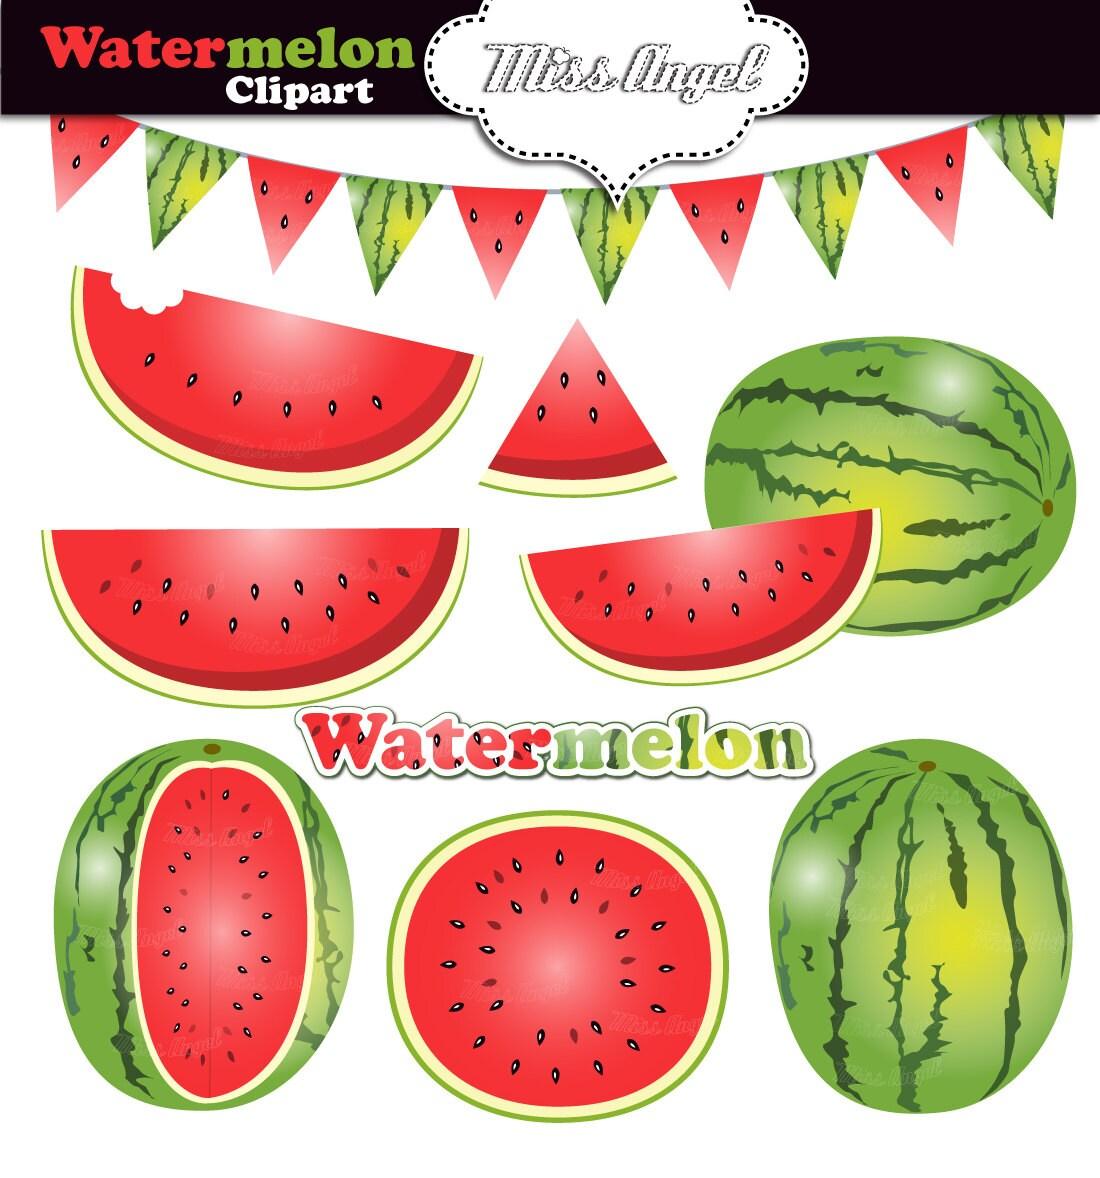 Watermelon clipart summer fruits clipart digital fresh for Clipart frutta